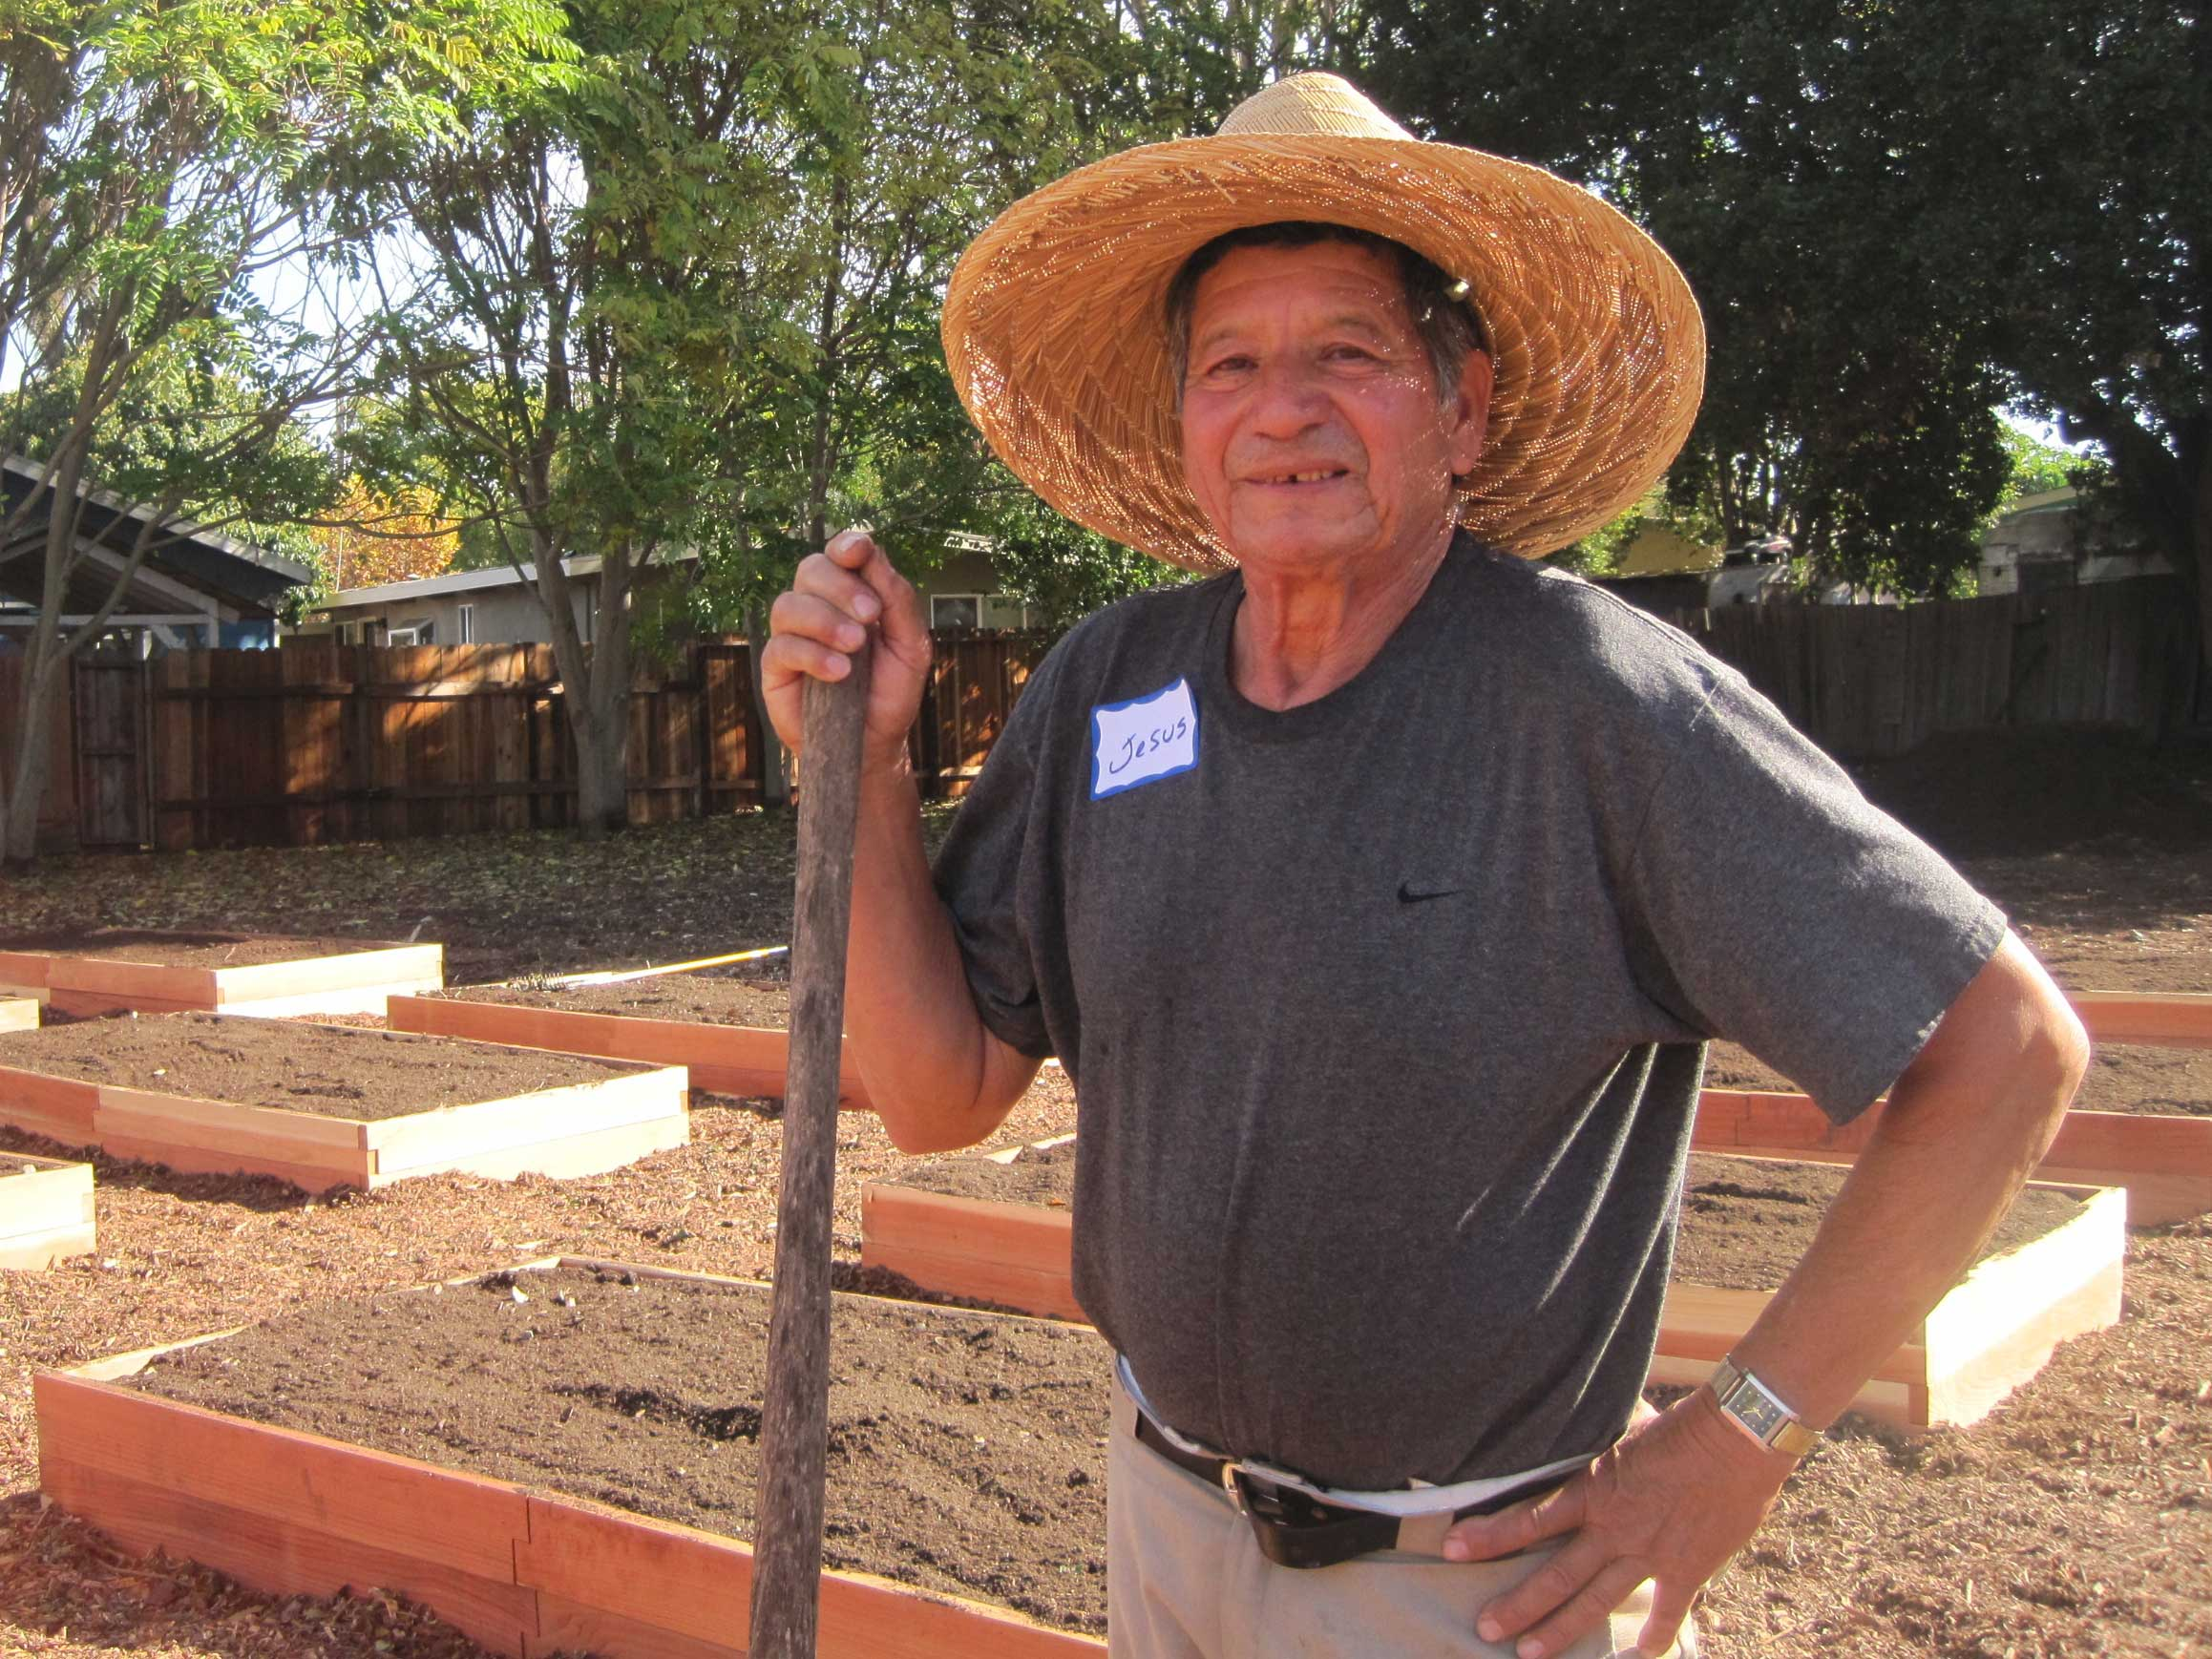 esus becerra helps build belle havens first community garden on nov 8 2014